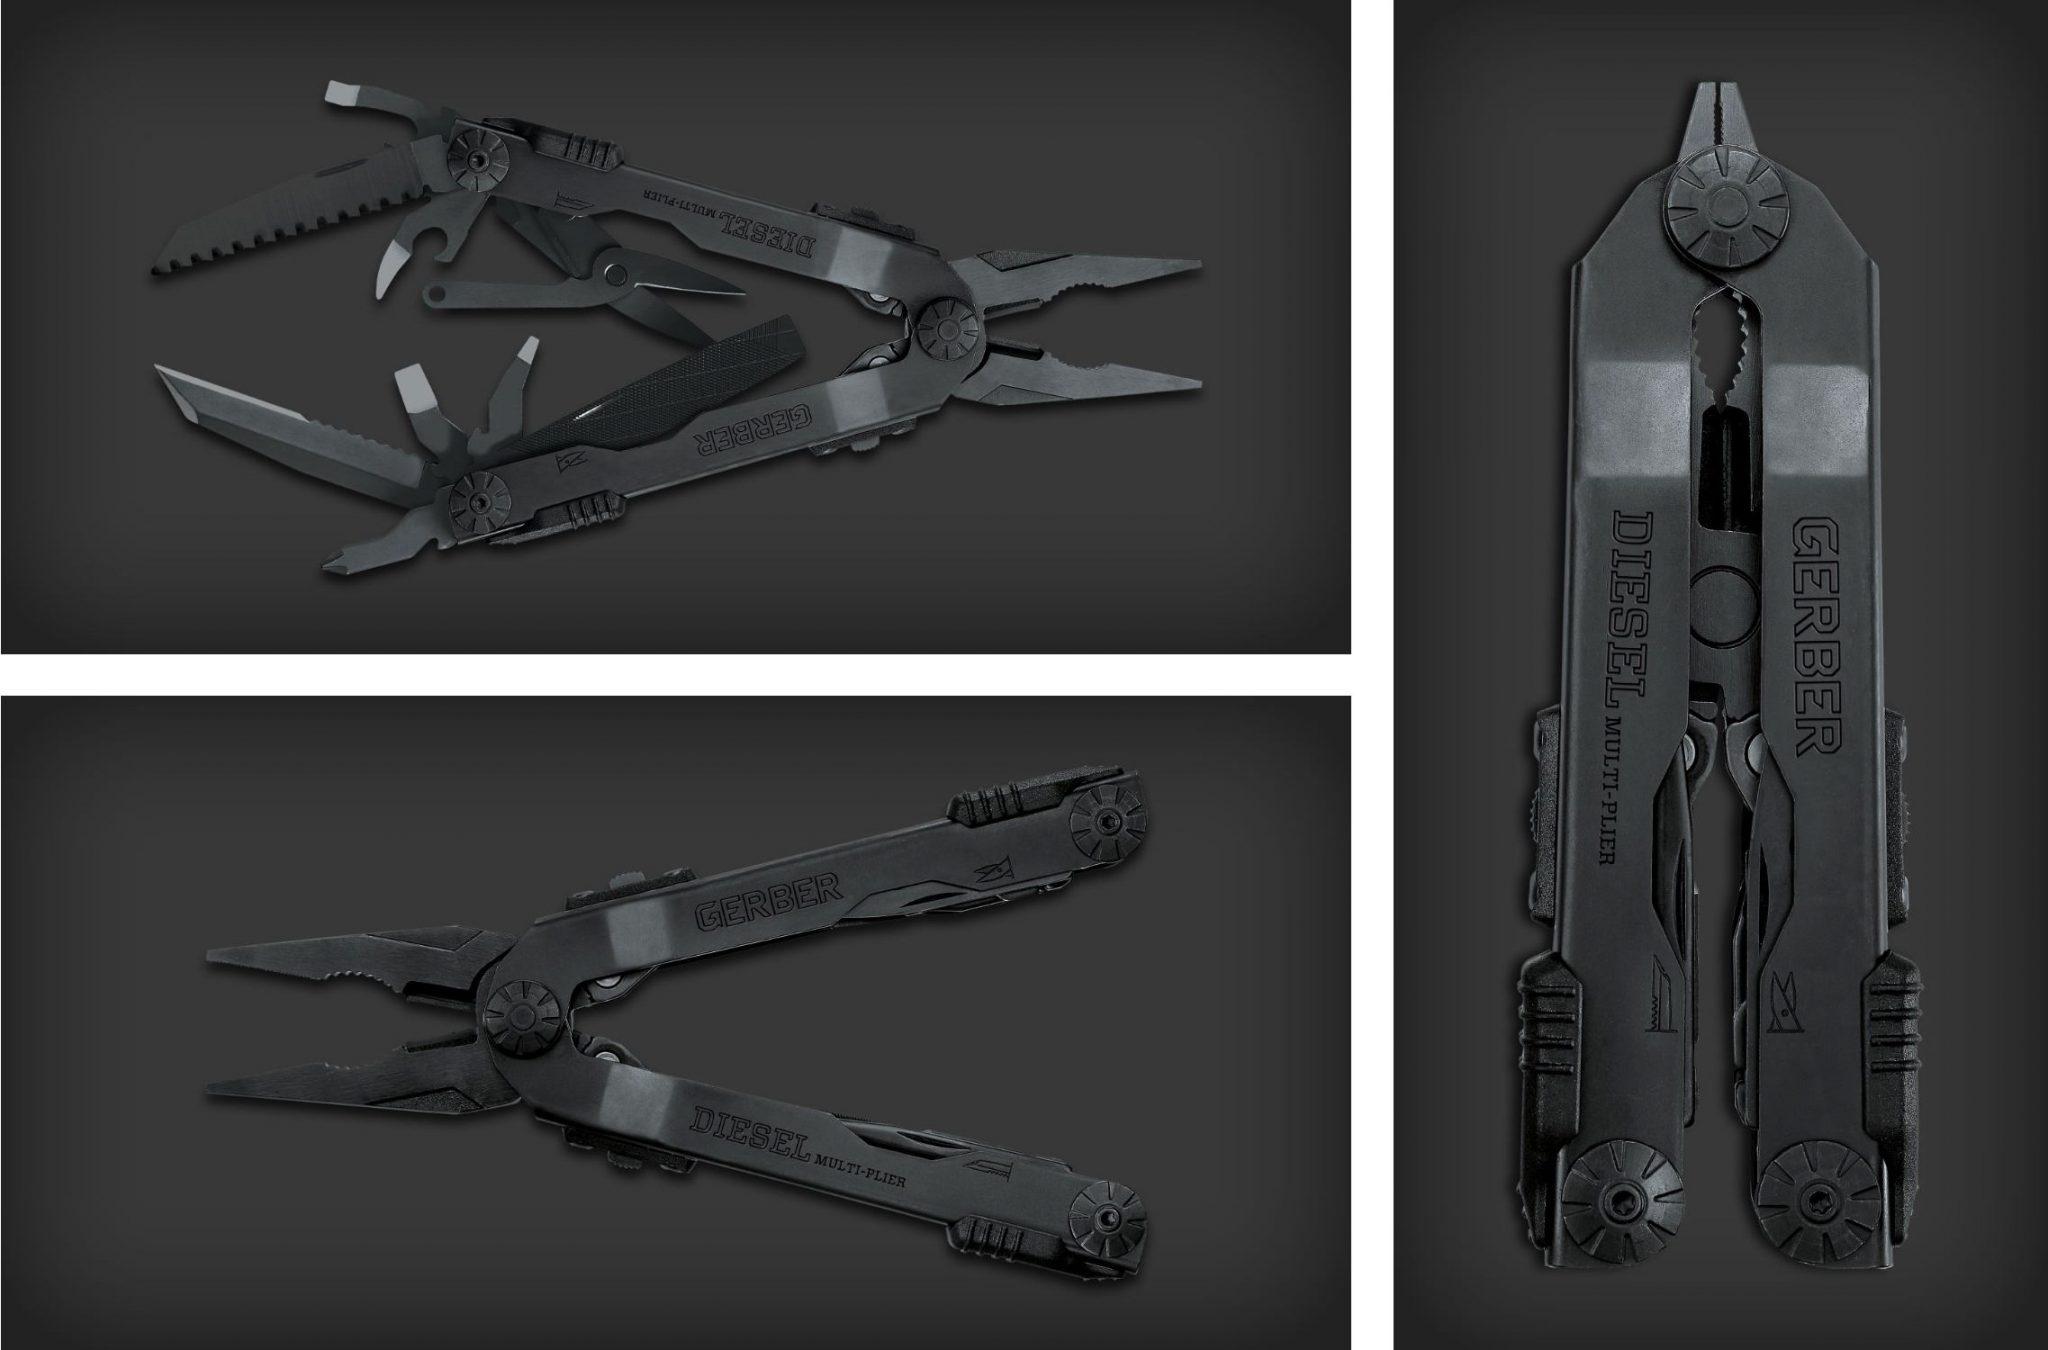 Gerber Multi-Plier